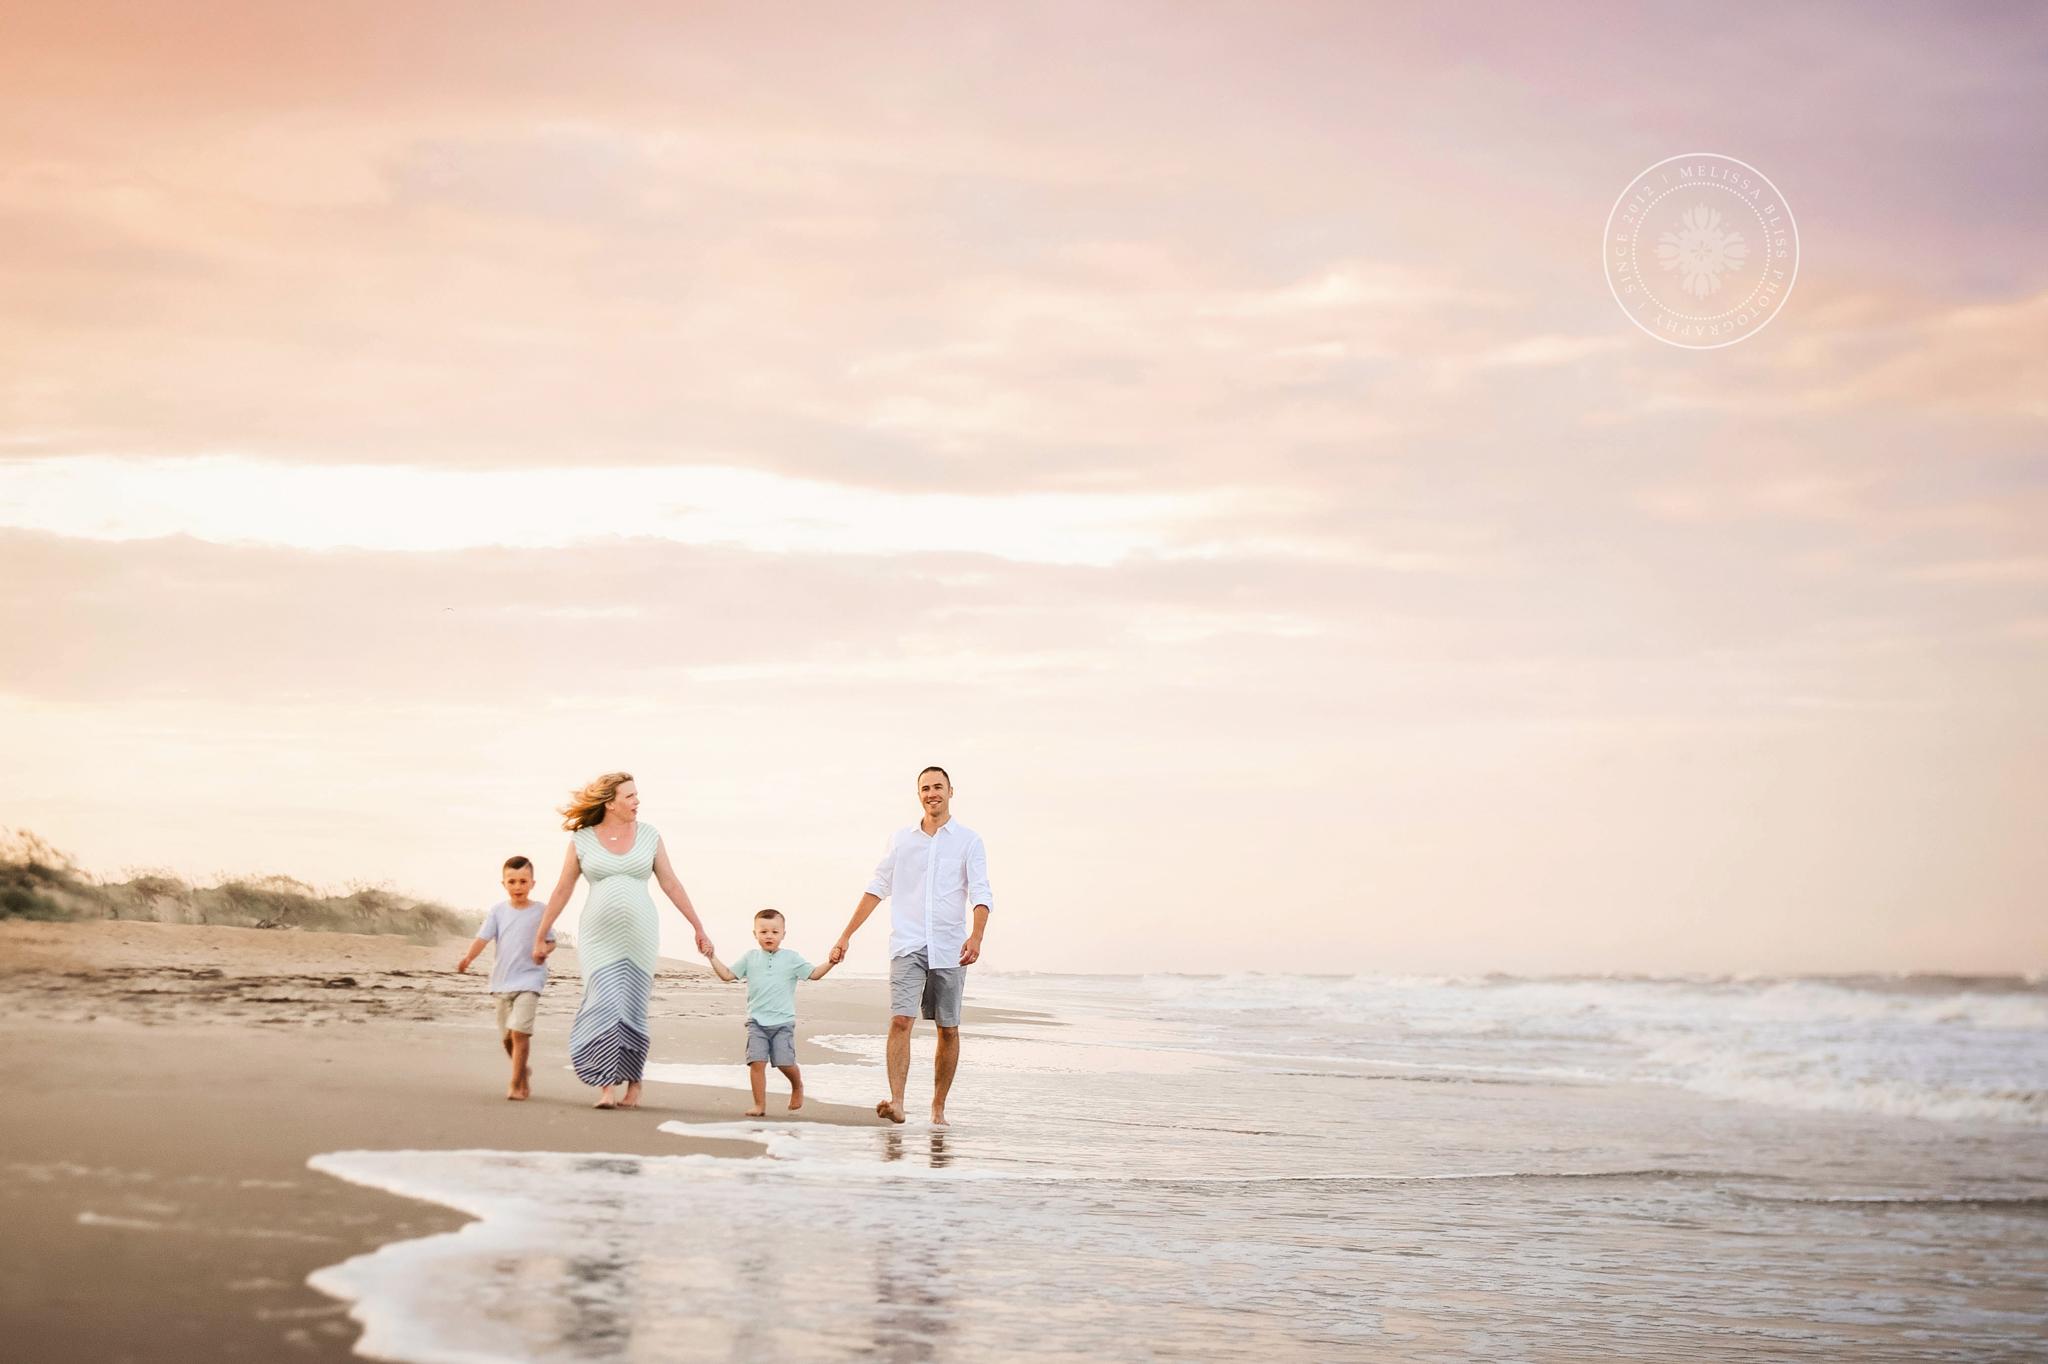 virginia-beach-maternity-photographers-norfolk-chesapeake-maternity-photos-melissa-bliss-photography-beach-maternity-session.jpg